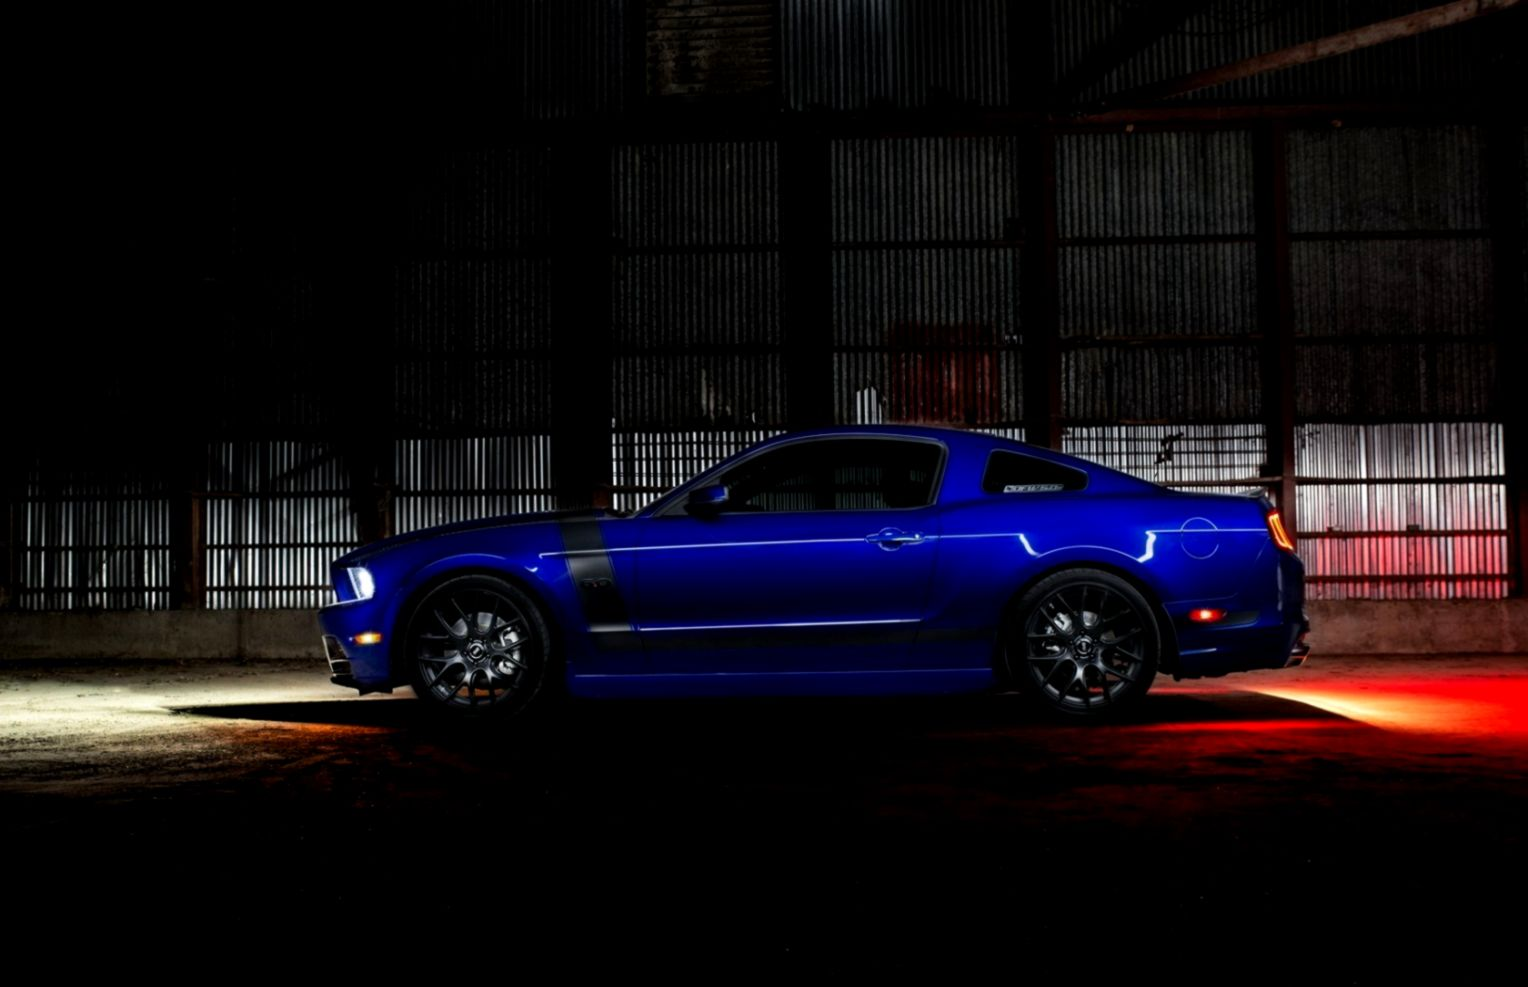 Ford Mustang Warehouse Car HD Wallpaper   FreeWallsUp